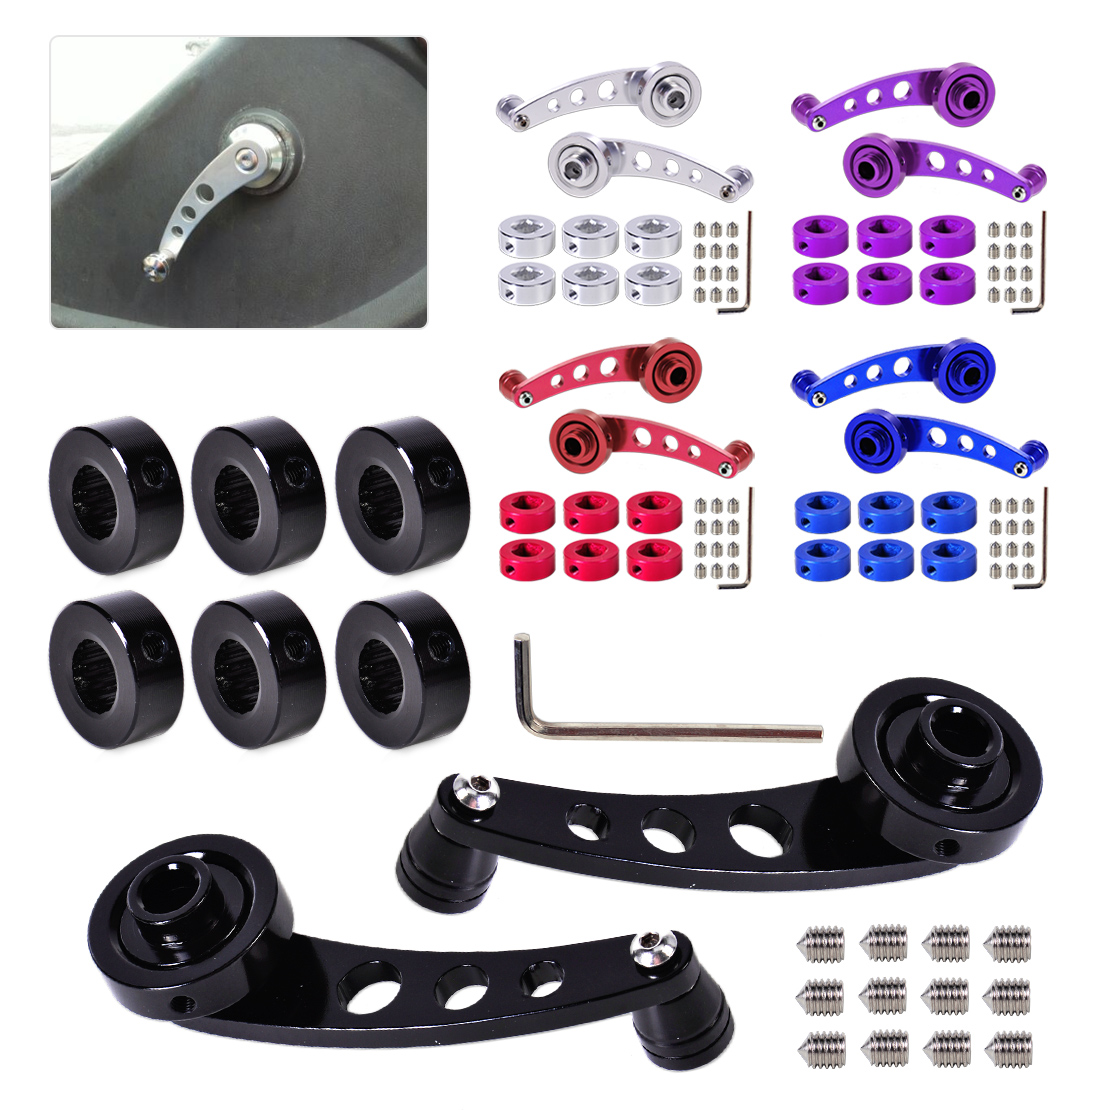 Toyota Sienna 2010-2018 Owners Manual: Aluminum wheel precautions